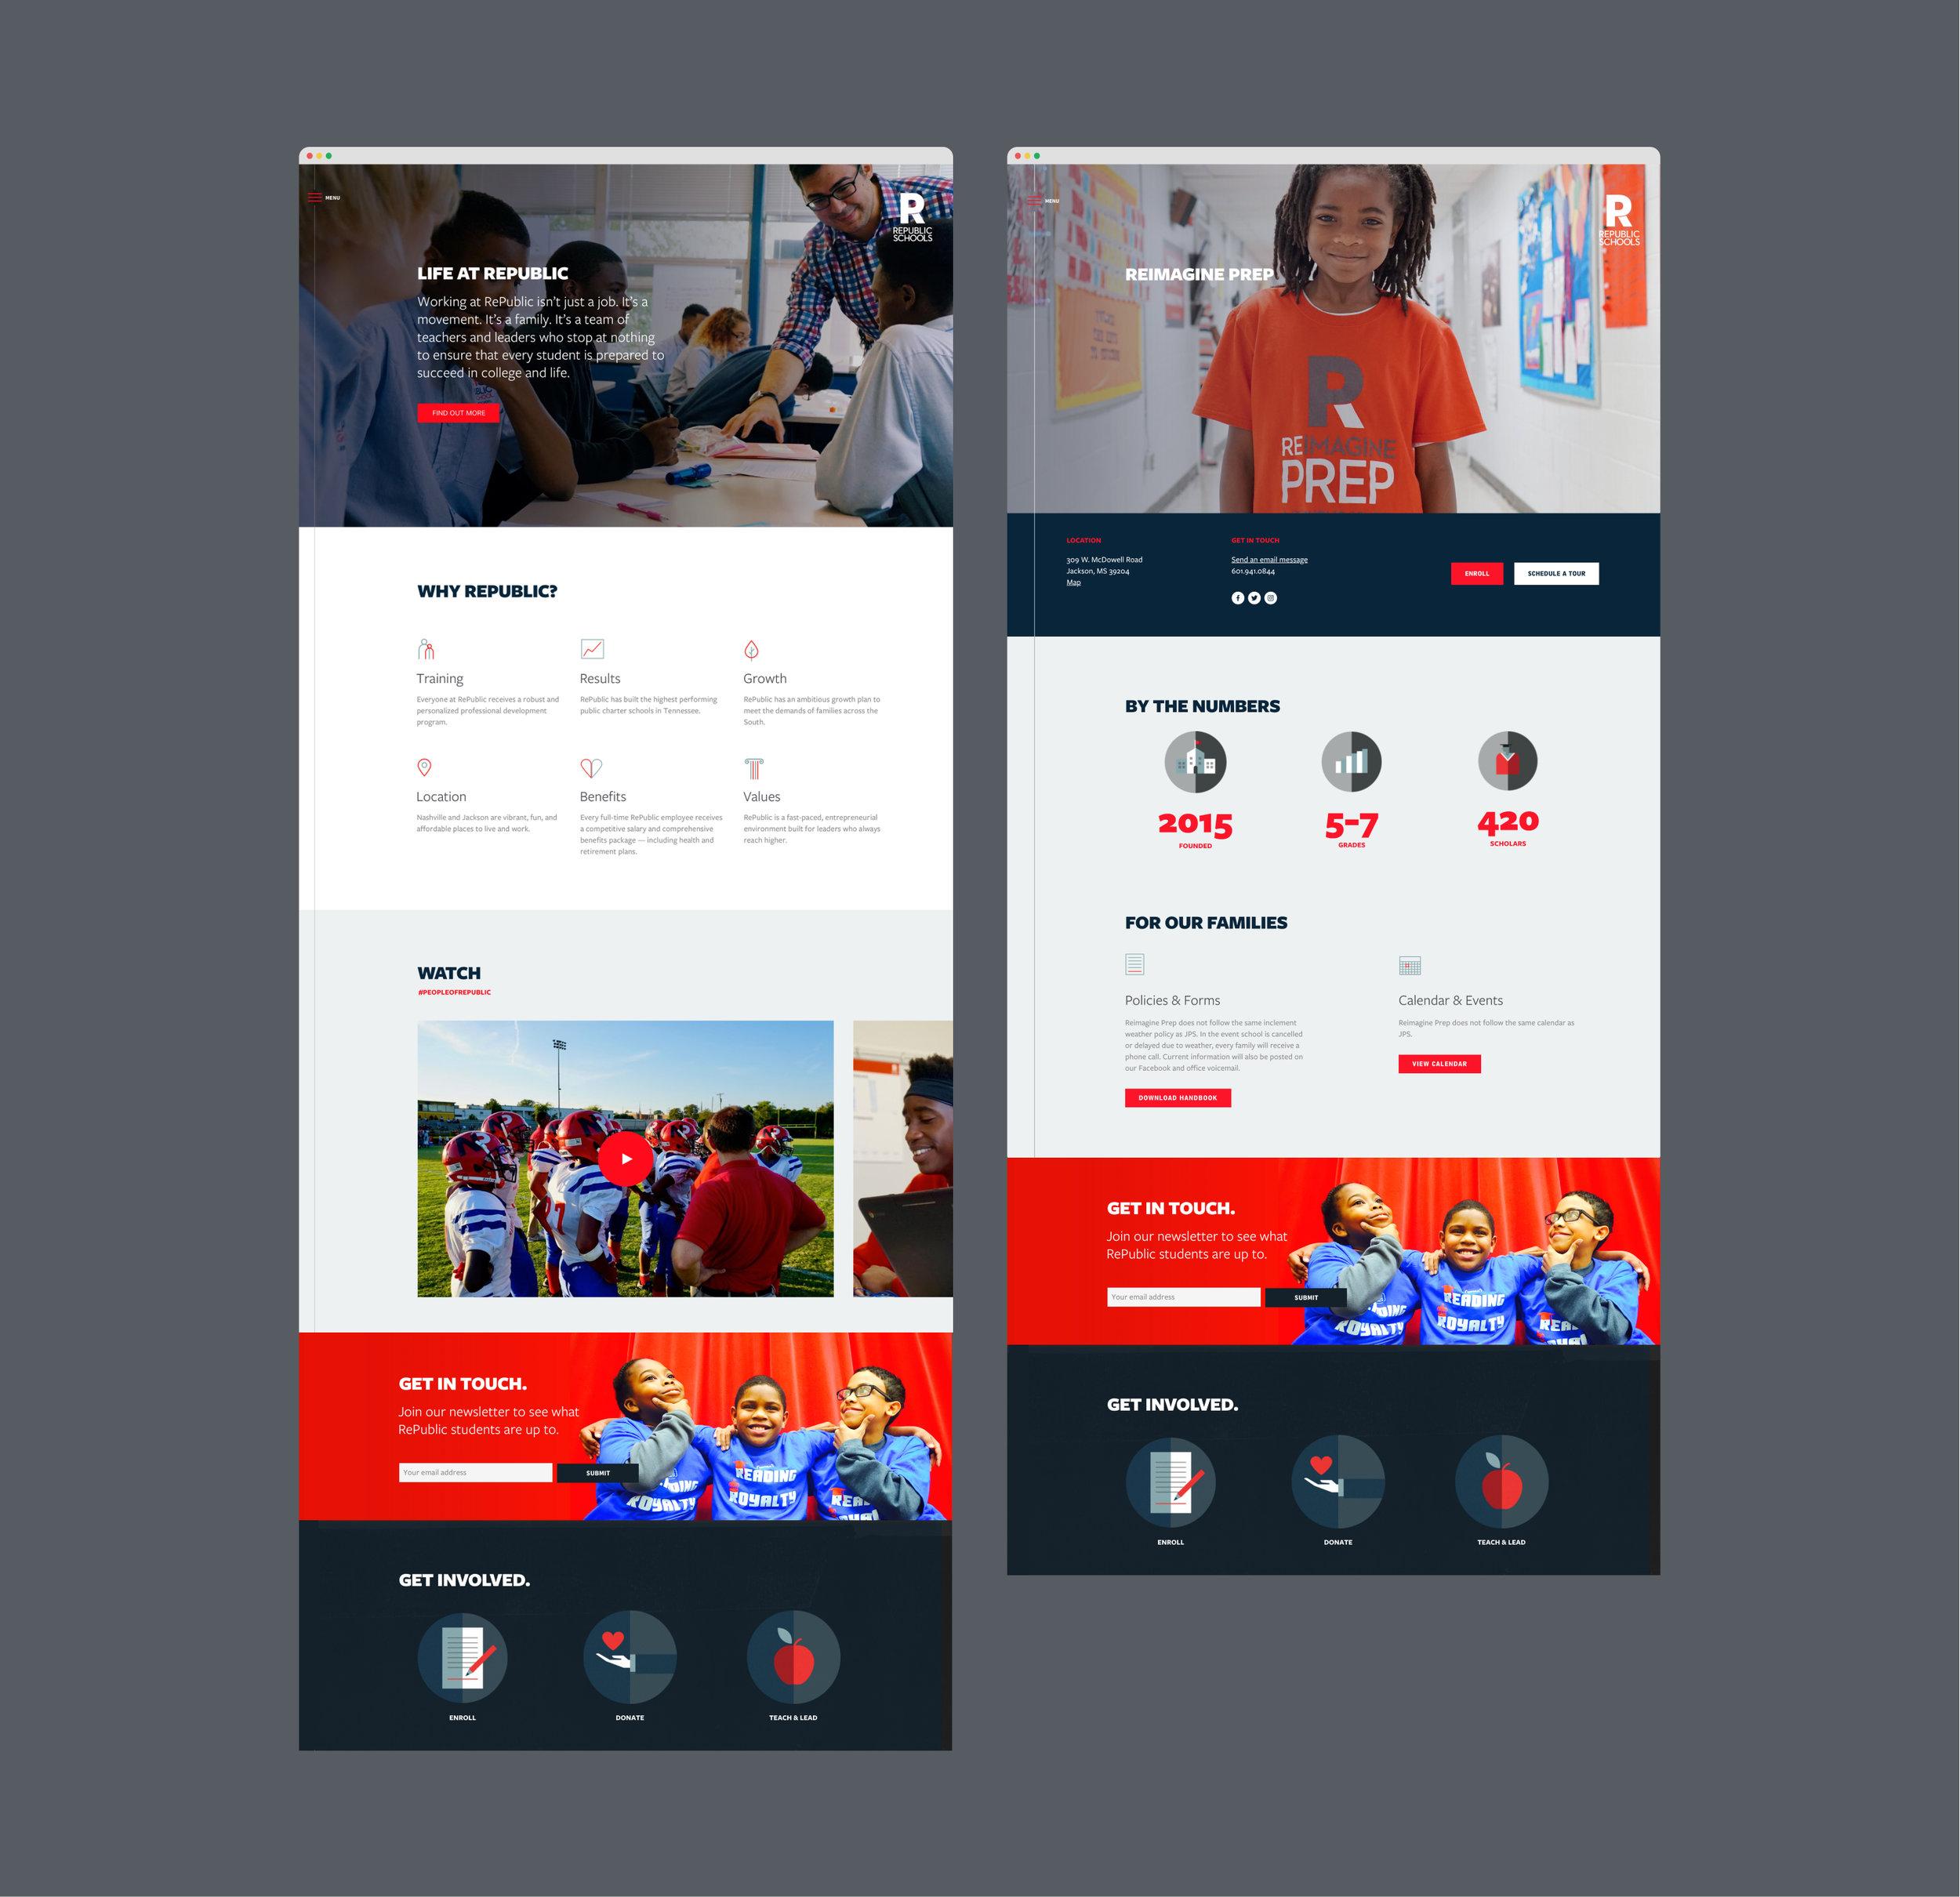 5b770c98d0e57867b011295b_republic-schools-studio-rubric.jpg